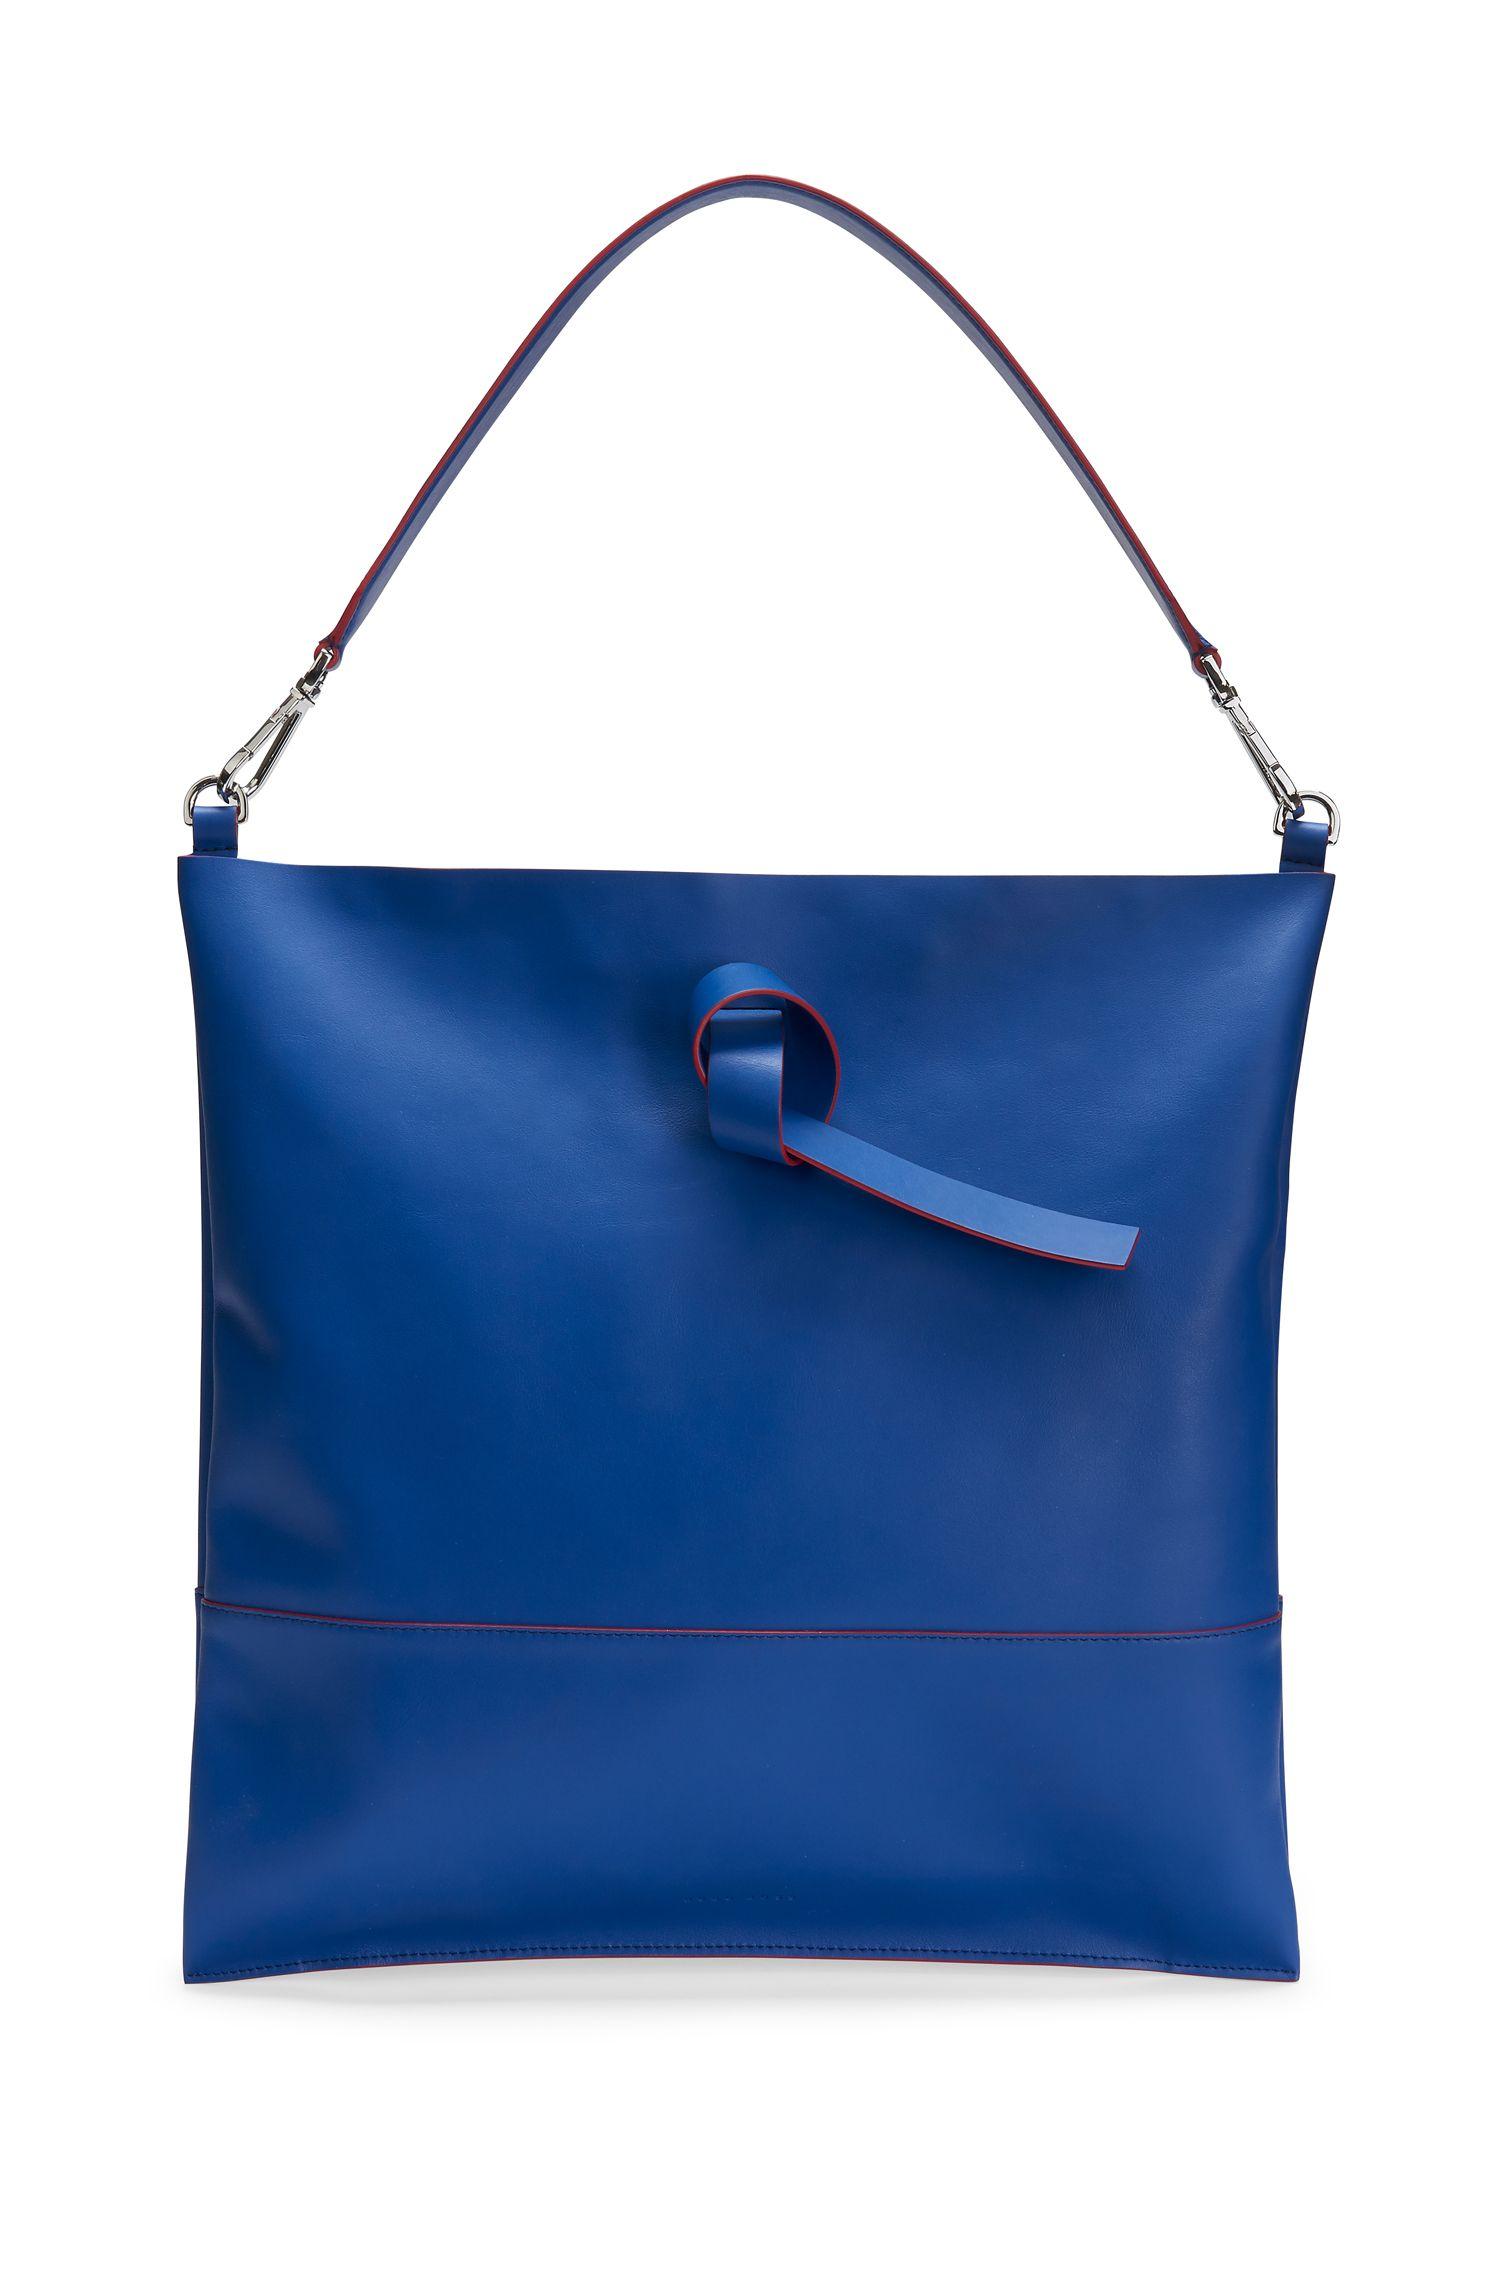 'Modern Day Tote' | Italian Leather Handbag, Detachable Strap